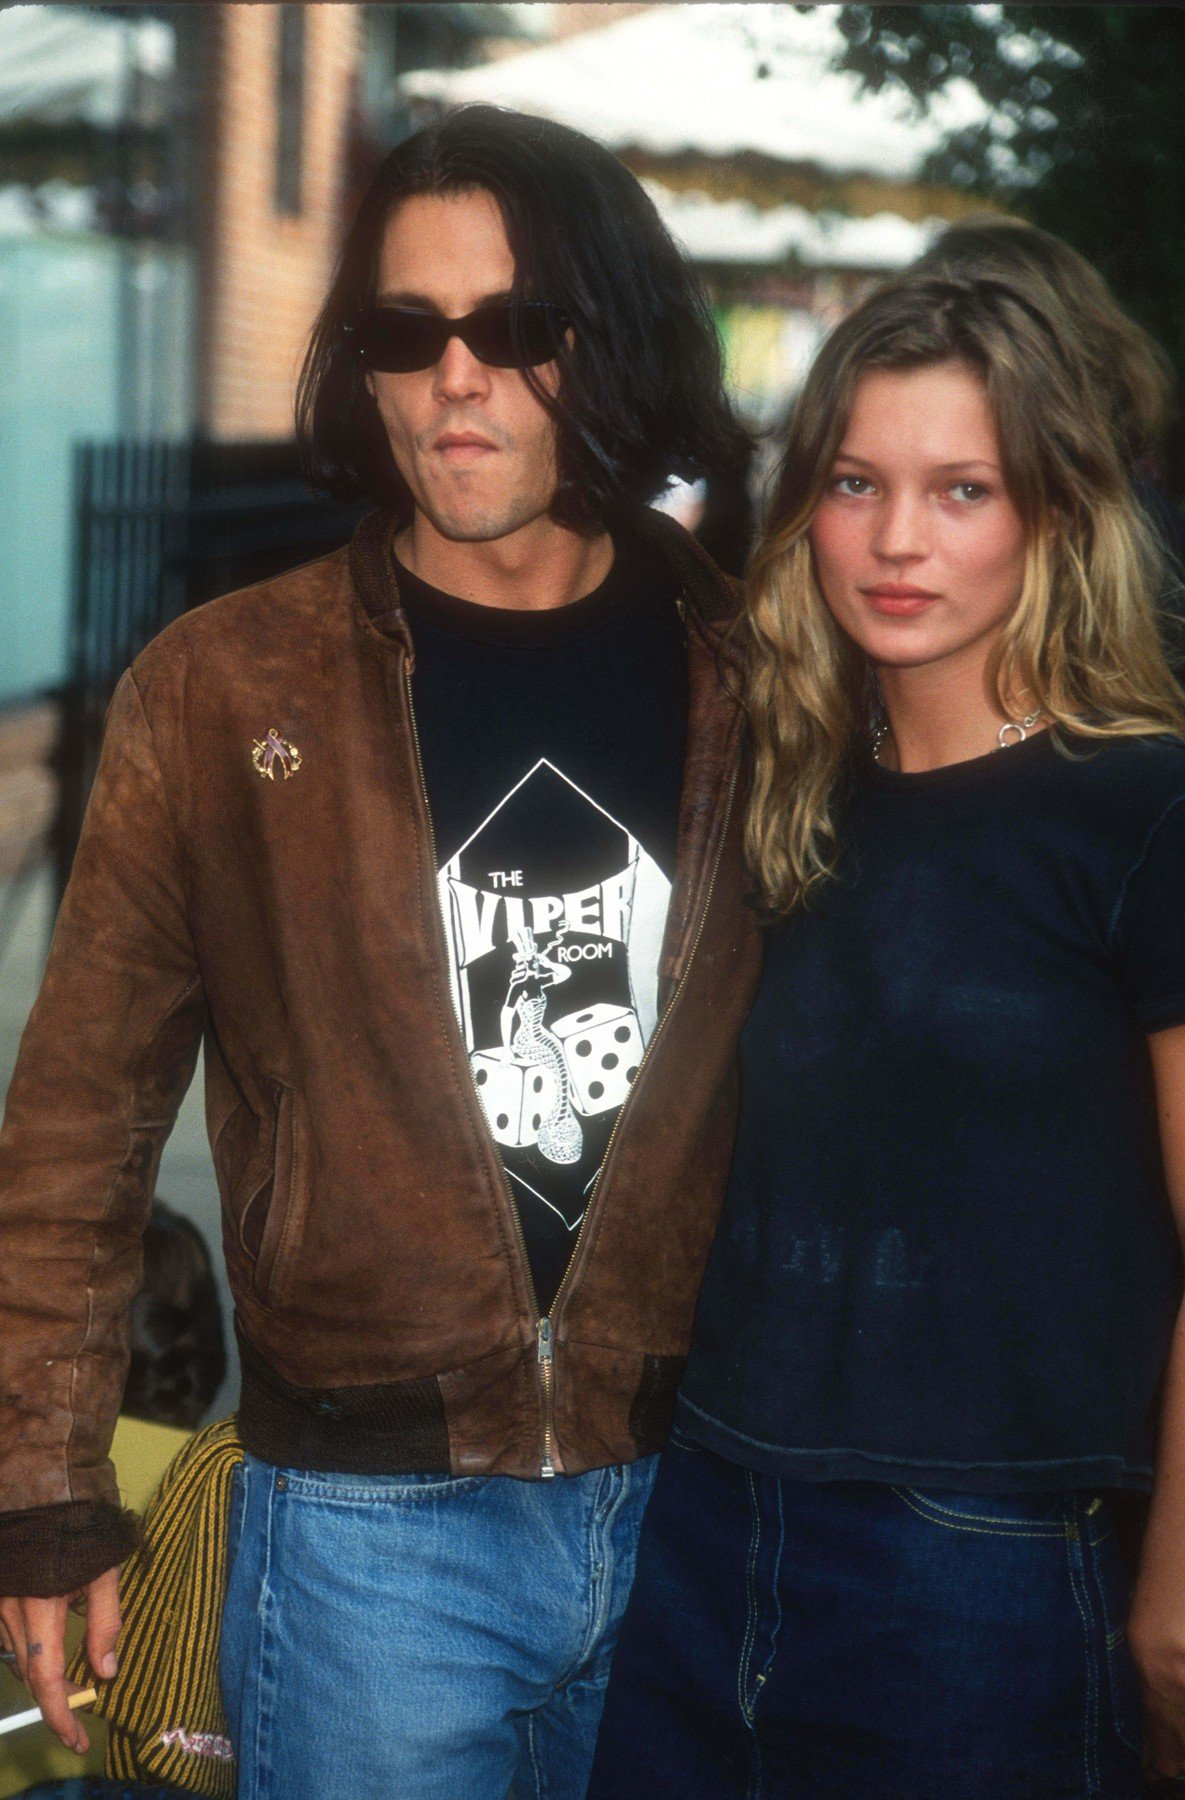 Johnny Depp Kate Moss Undated, Image: 388982552, License: Rights-managed, Restrictions: , Model Release: no, Credit line: Profimedia, Newscom